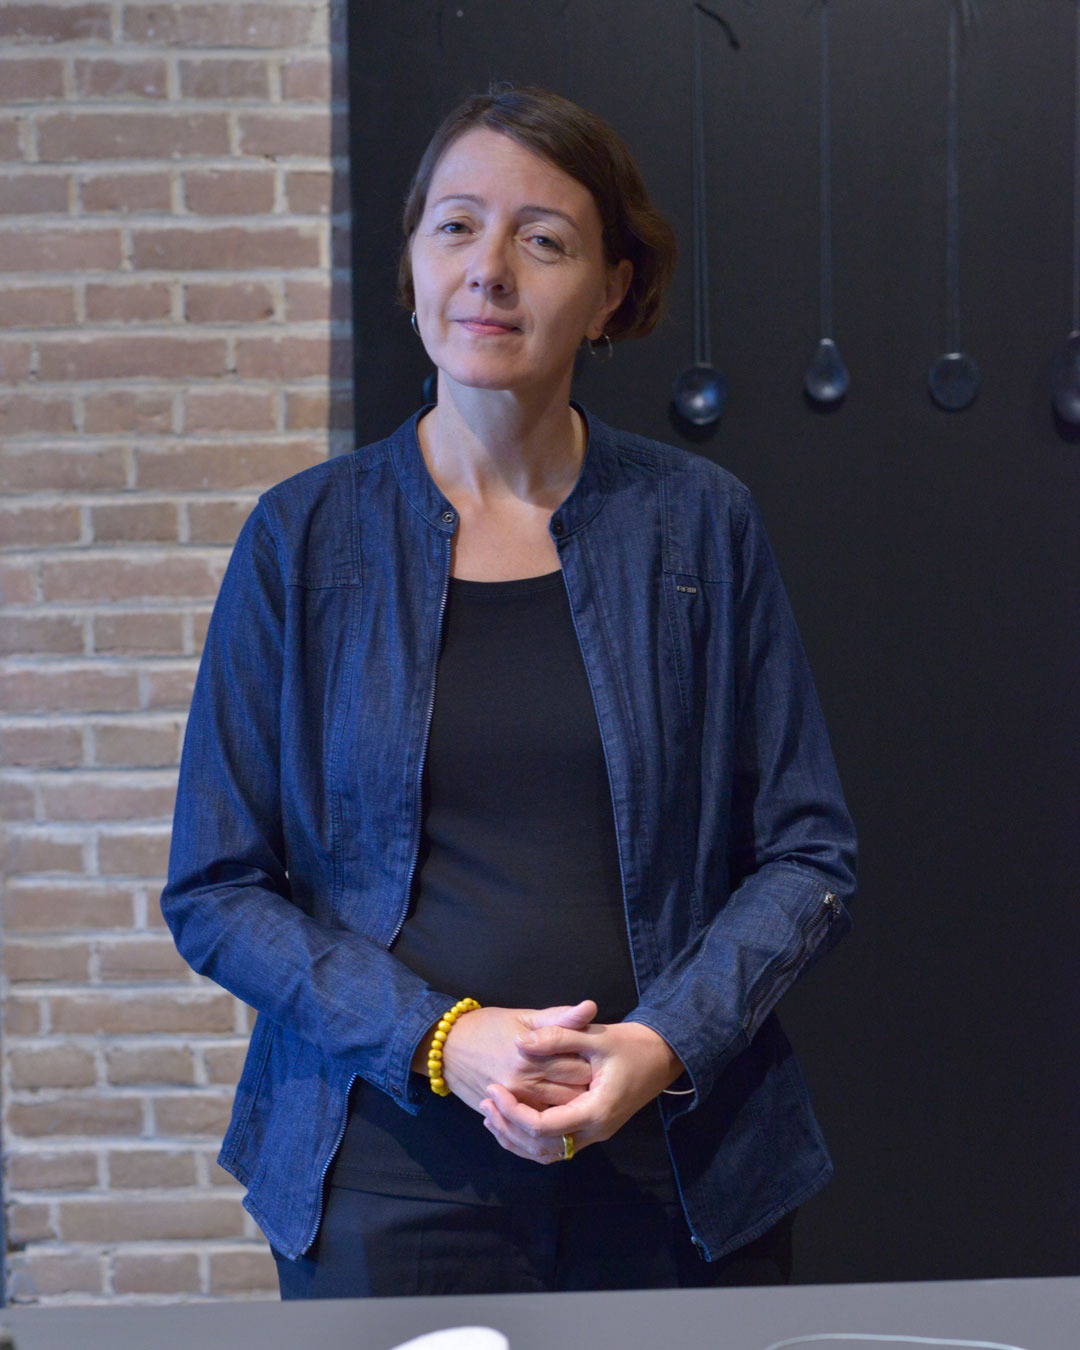 Karin Seufert, 2018